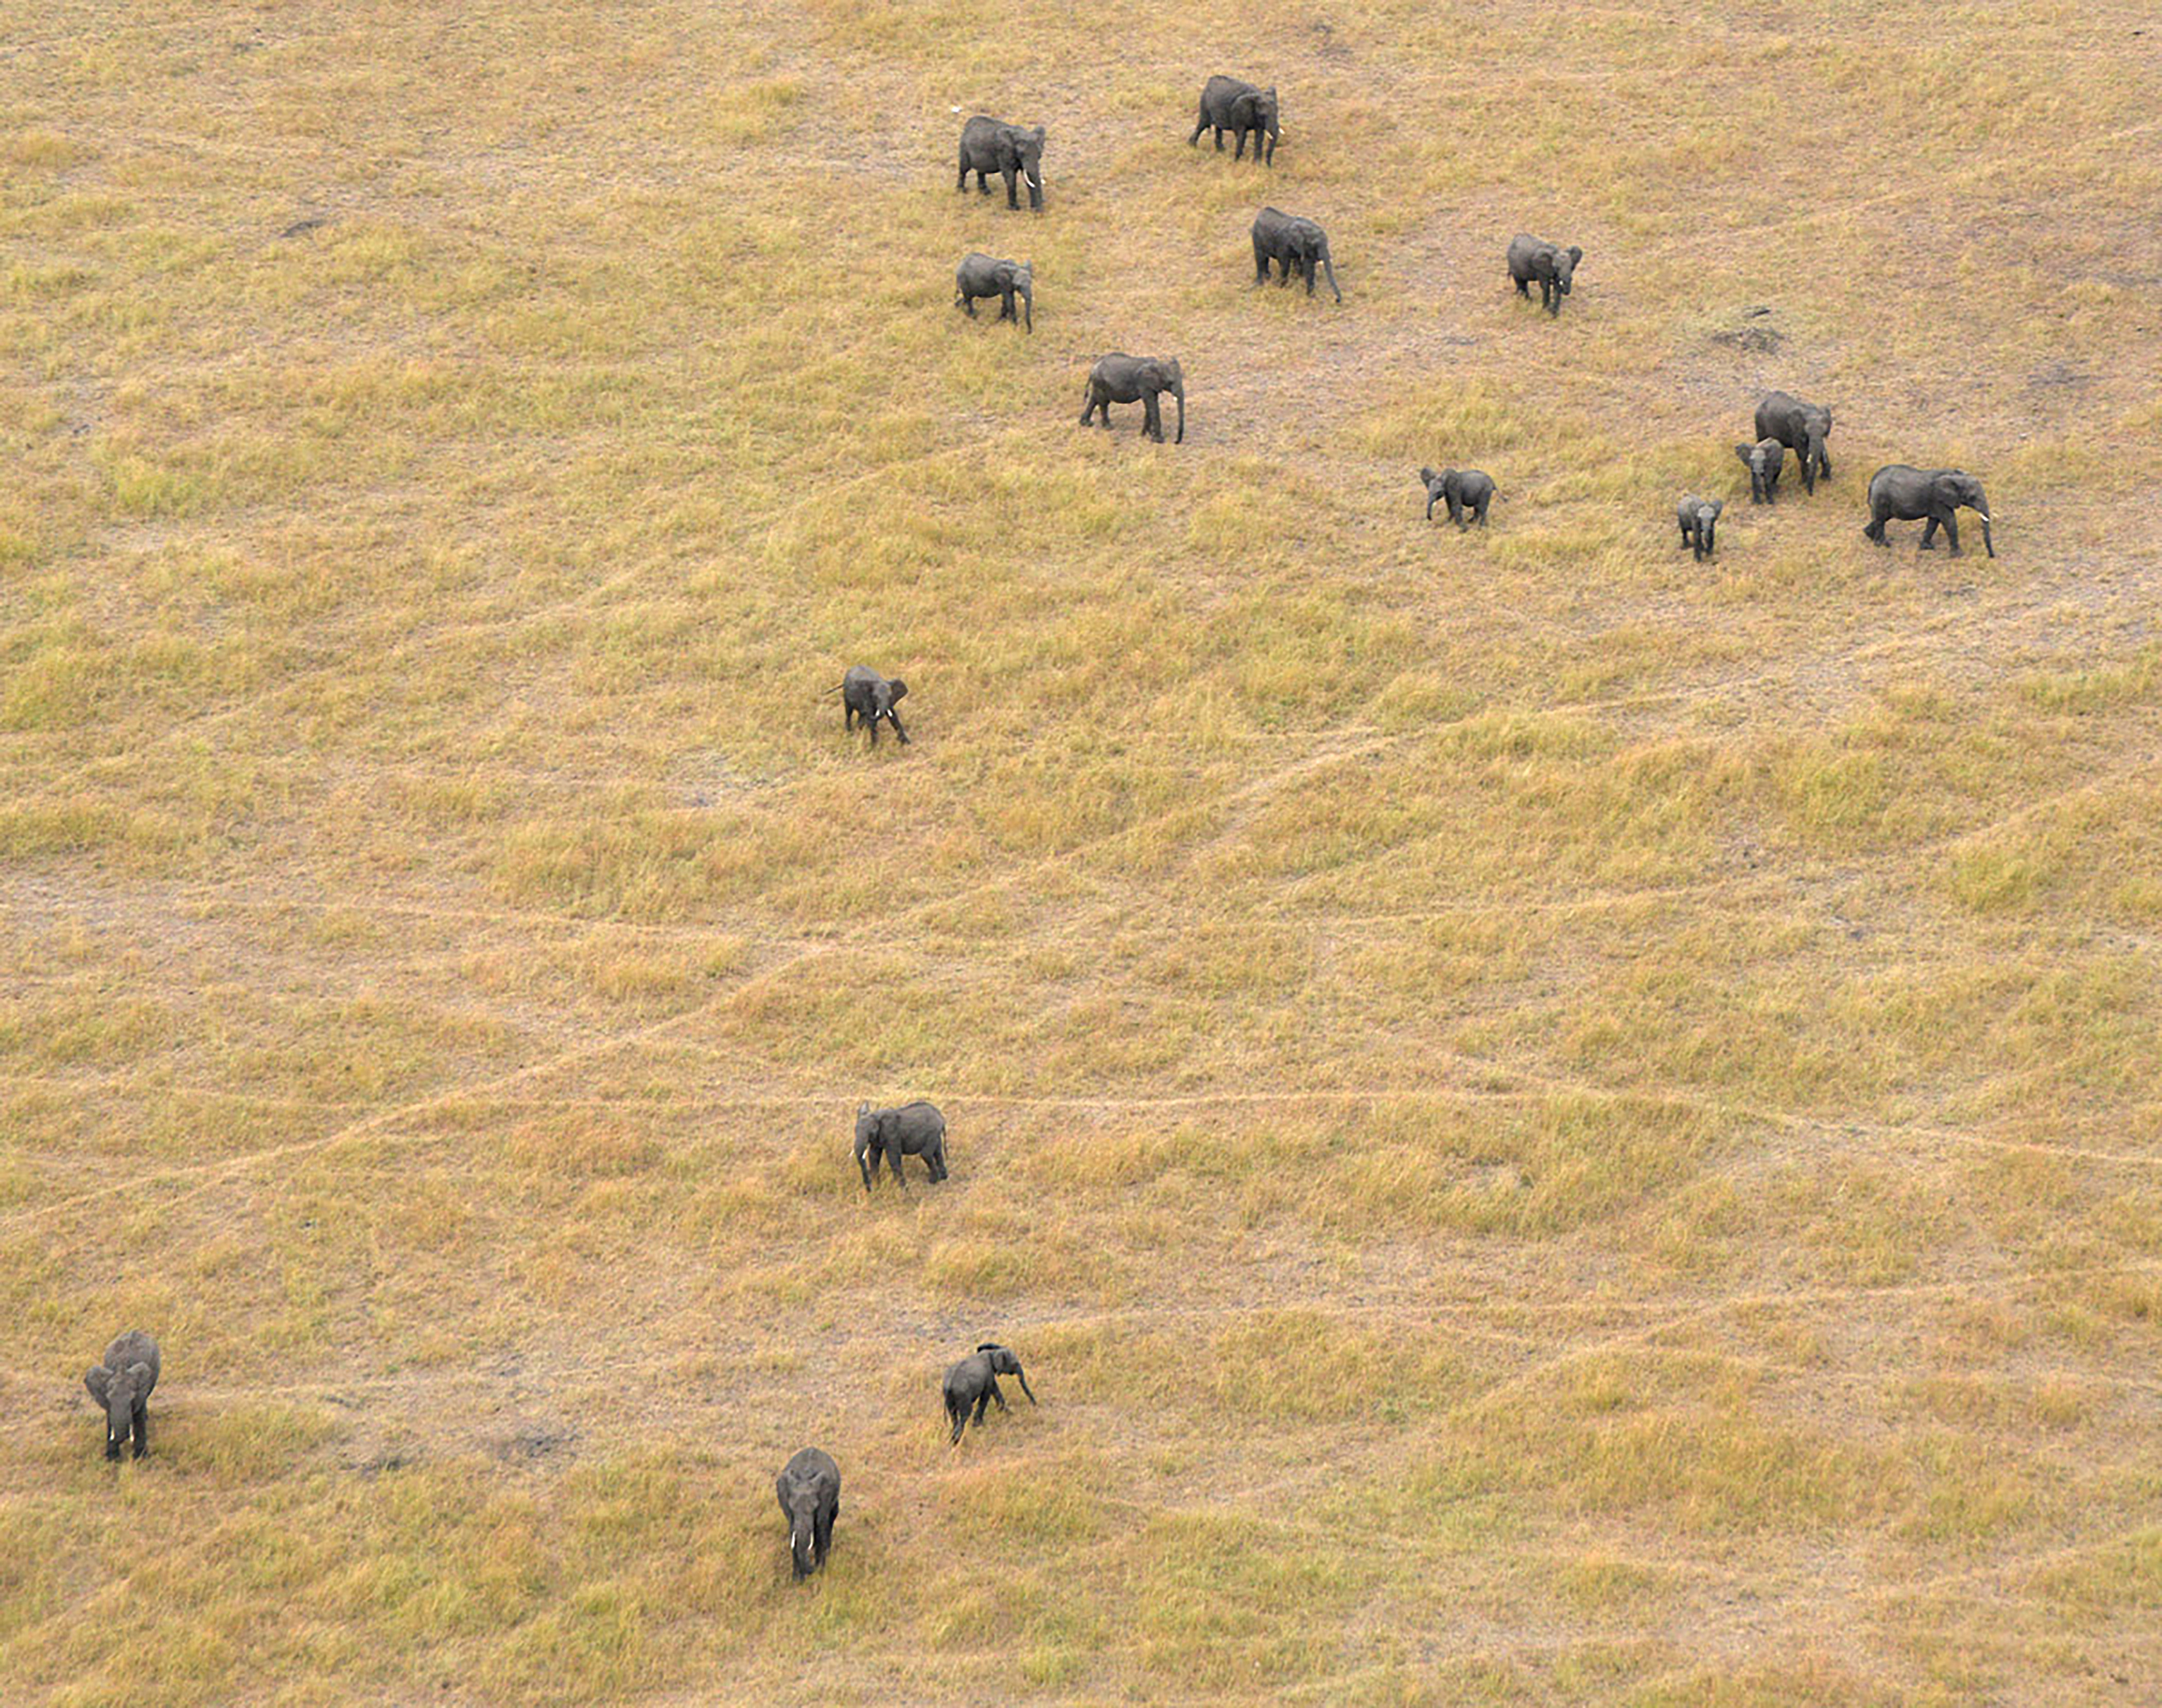 Elephants graze in Serengeti National Park in Tanzania, in June 2014.